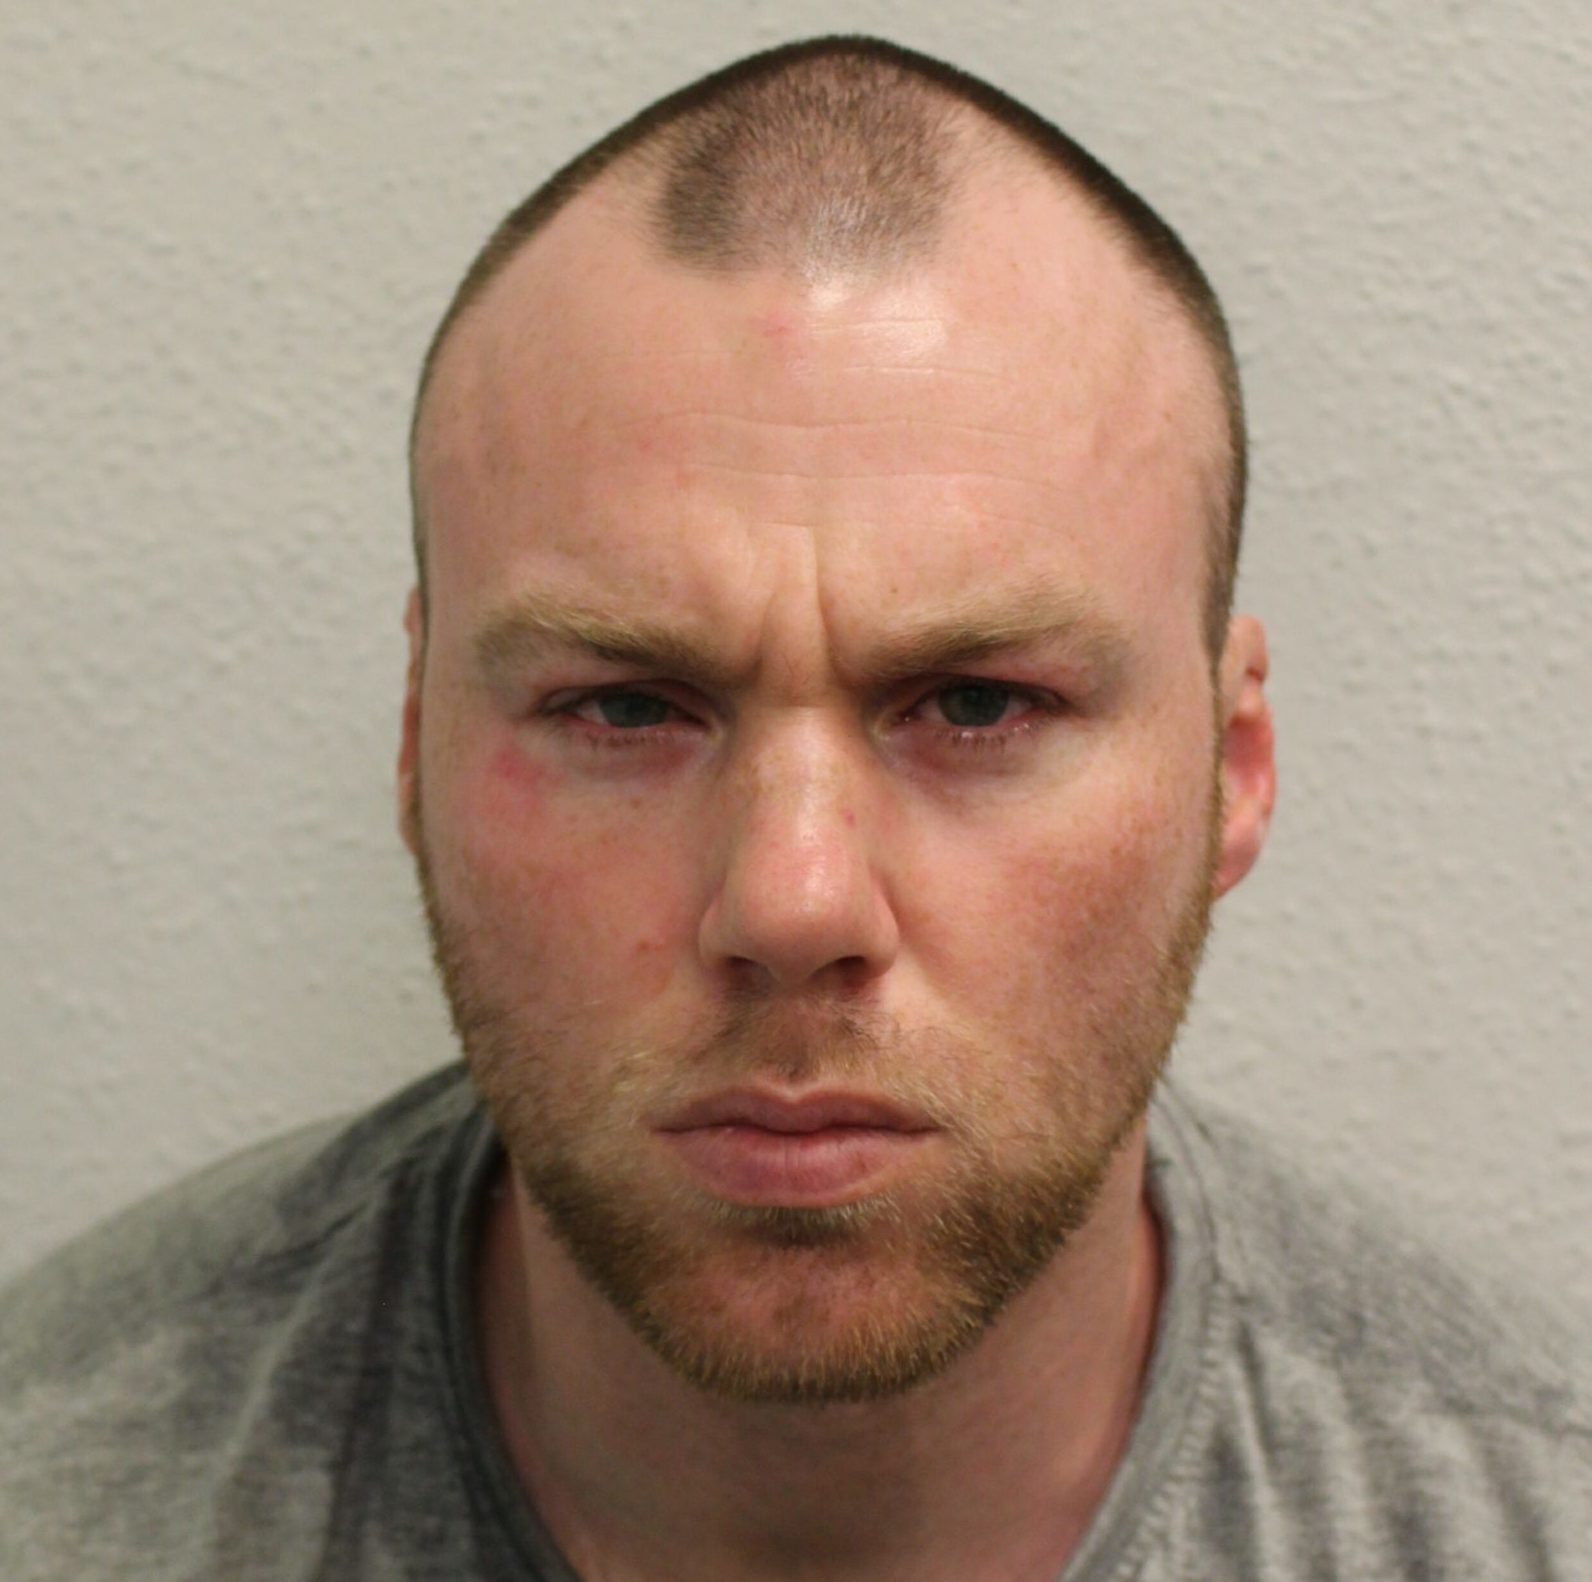 Dick pic killer faces life sentence